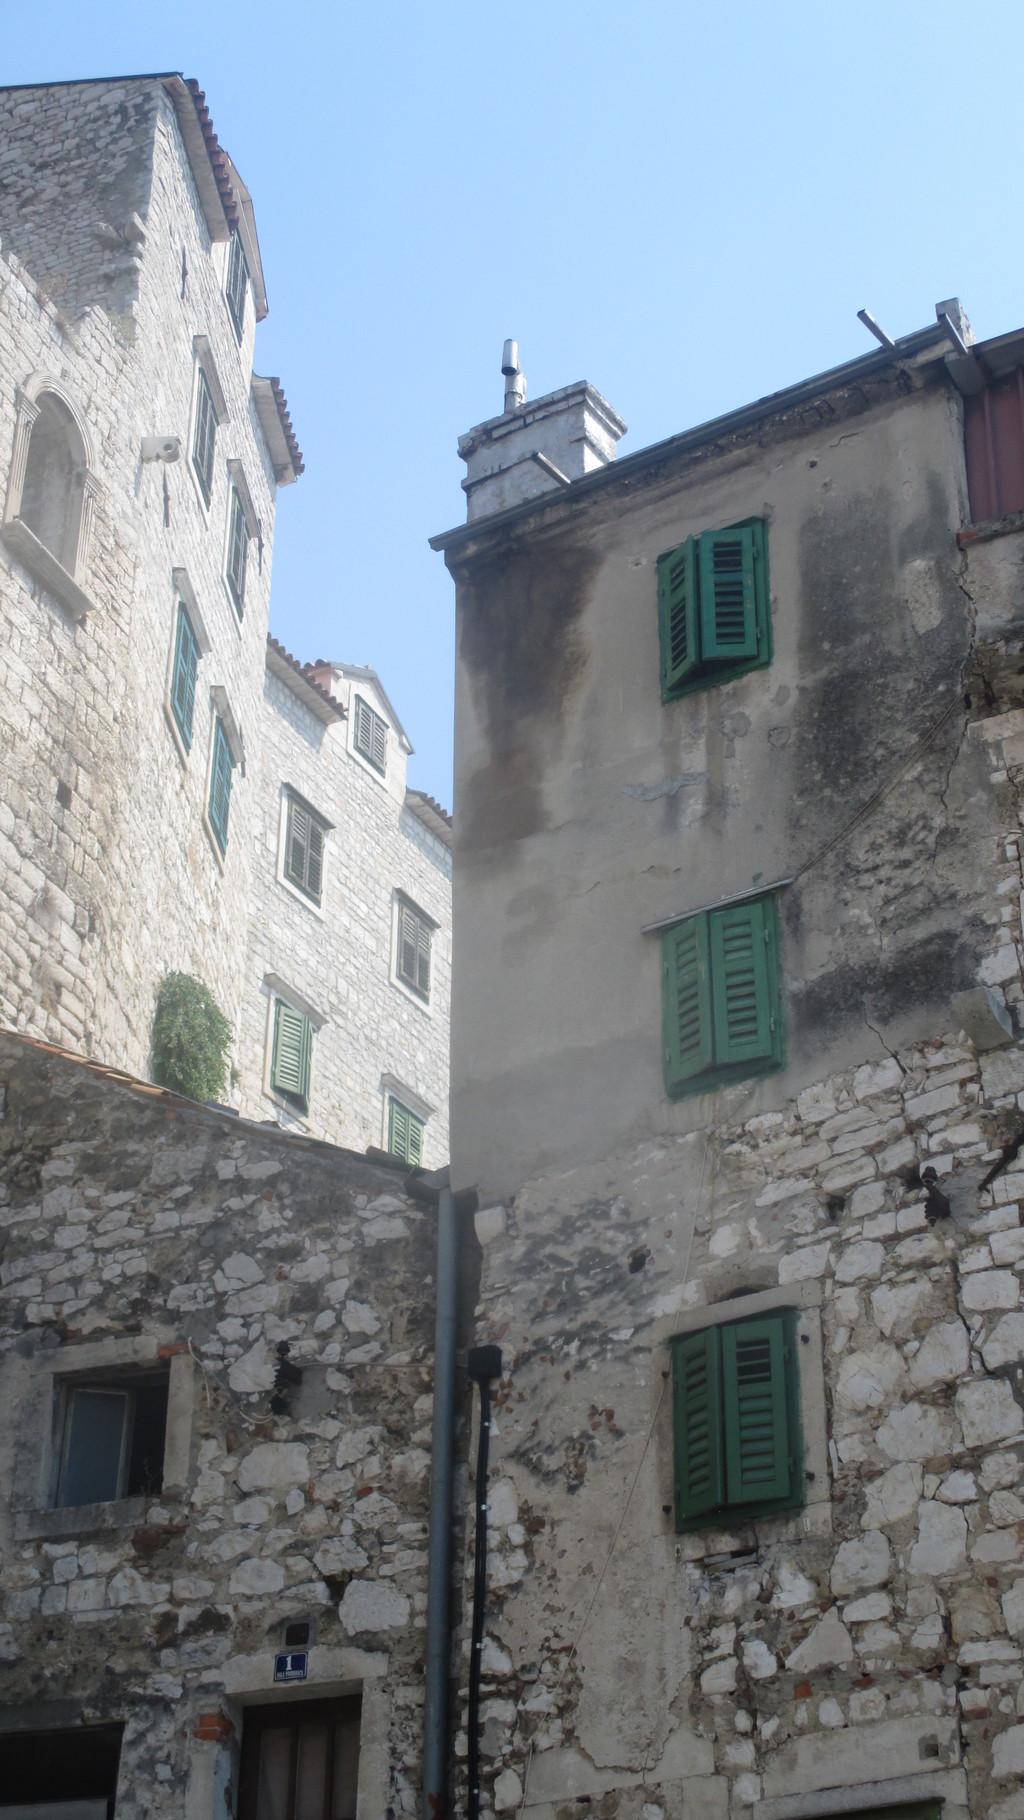 jour-4-visite-sibenik-la-plus-vieille-vi